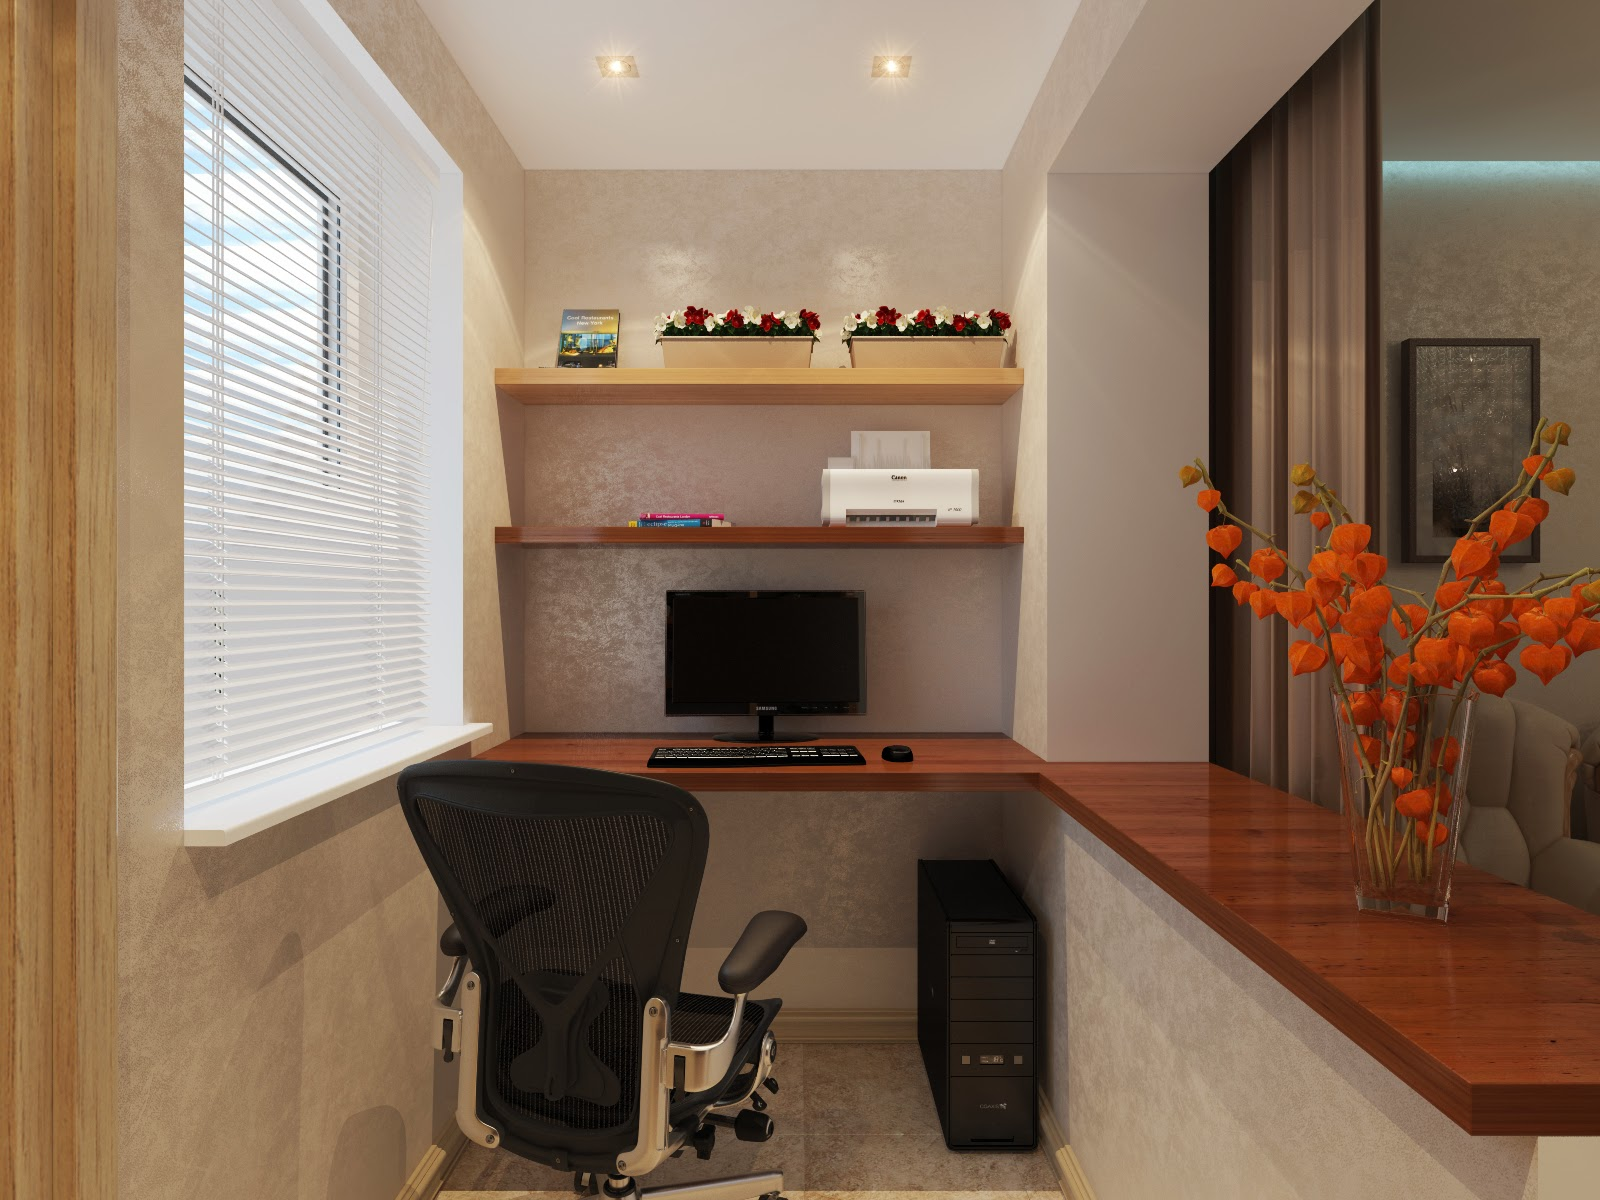 Лоджии. обустройство лоджии в квартире within 79 лучший дома.